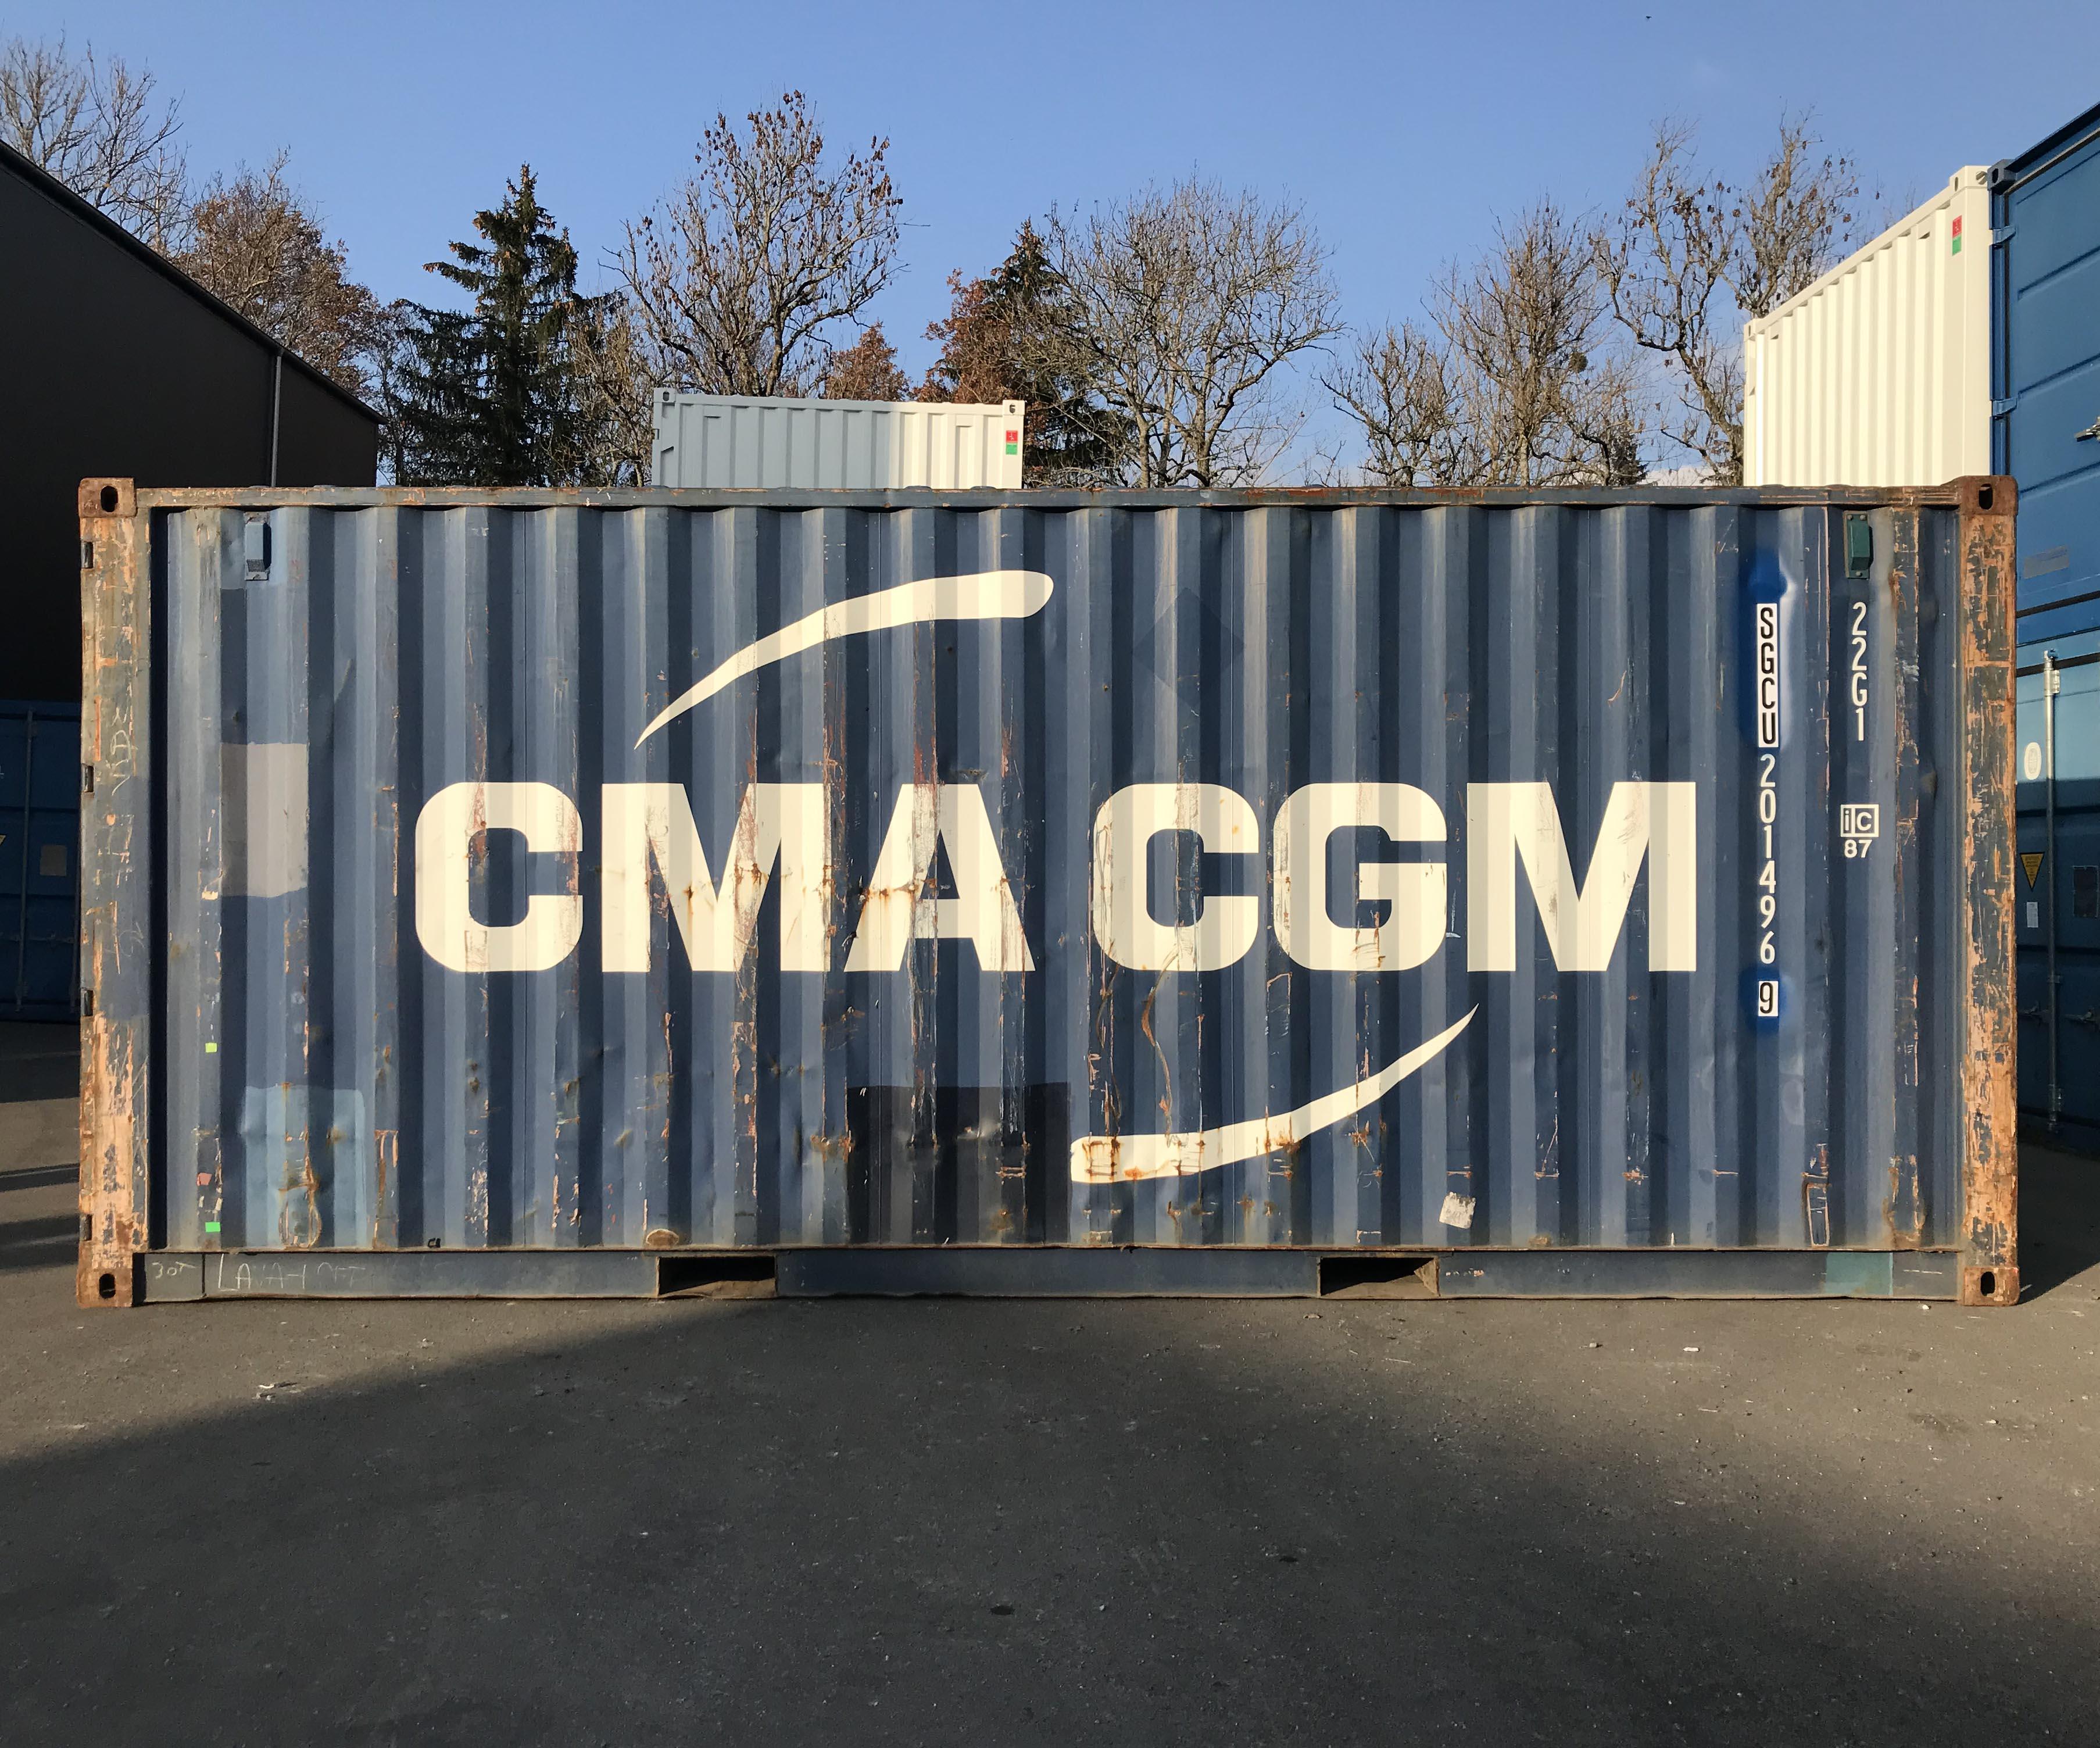 Container maritime bleu dernier voyage